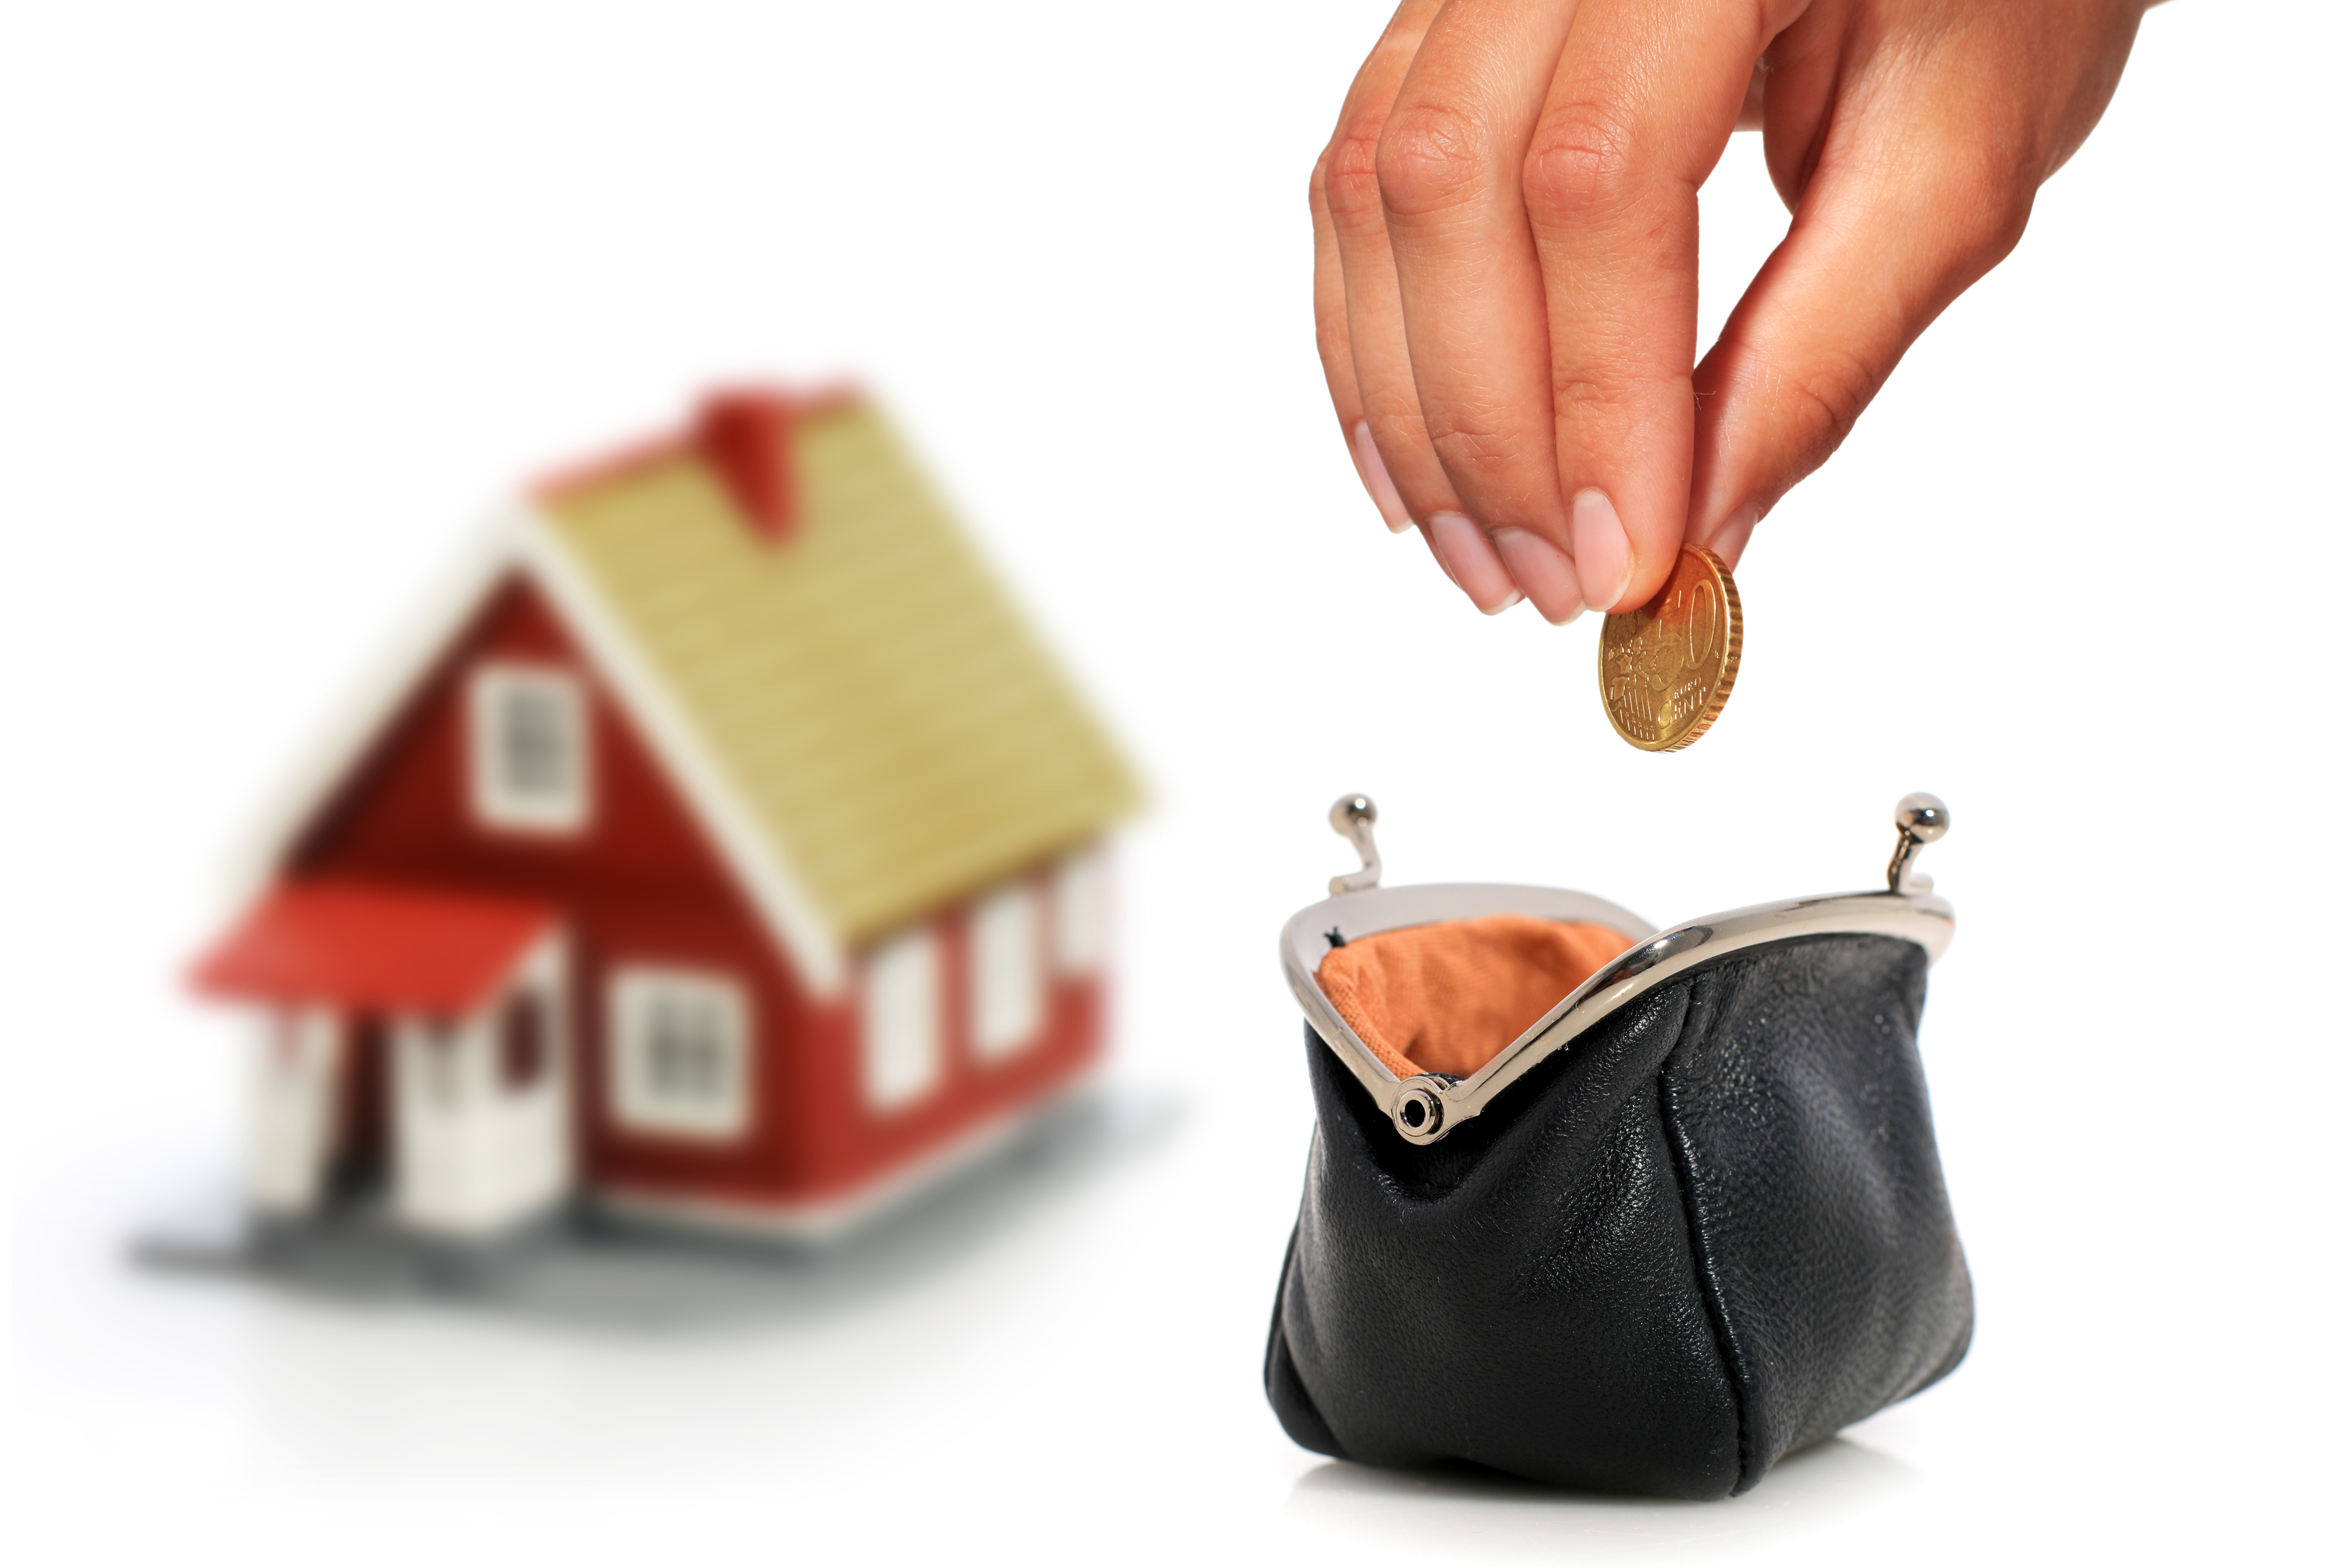 How millennials can save for a deposit